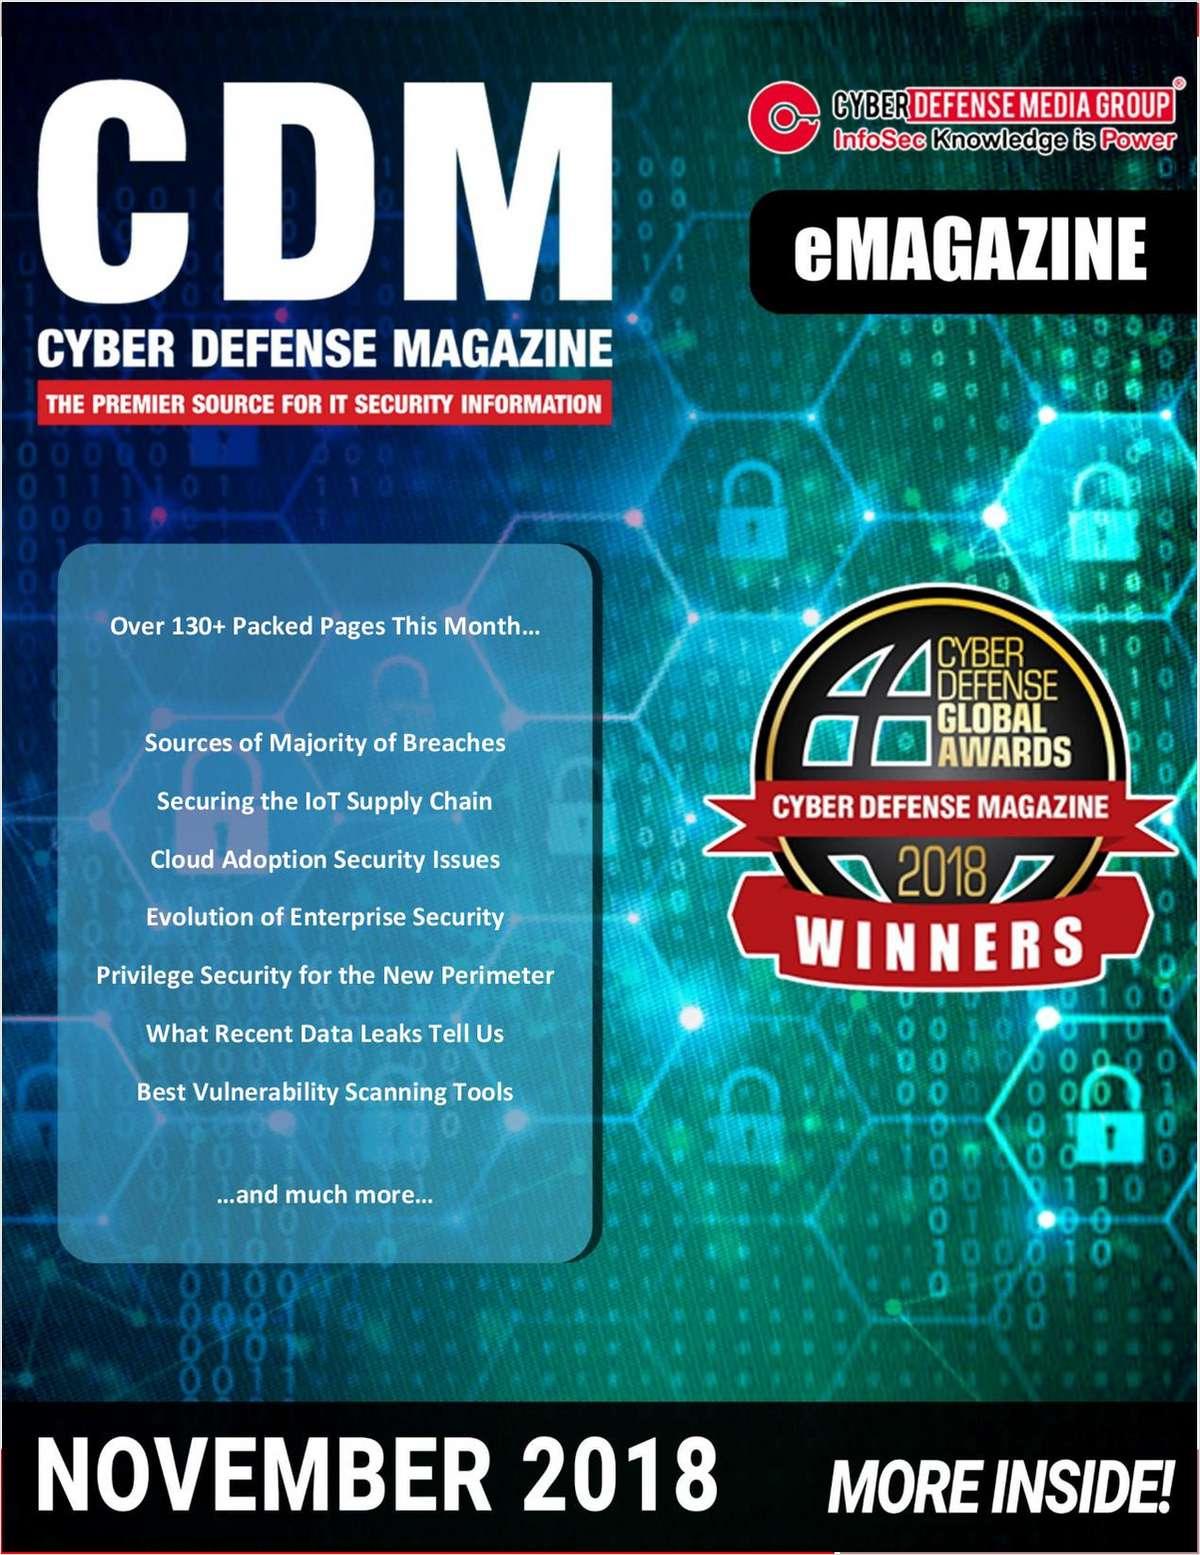 Cyber Defense eMagazine - Evolution of Enterprise Security - November 2018 Edition